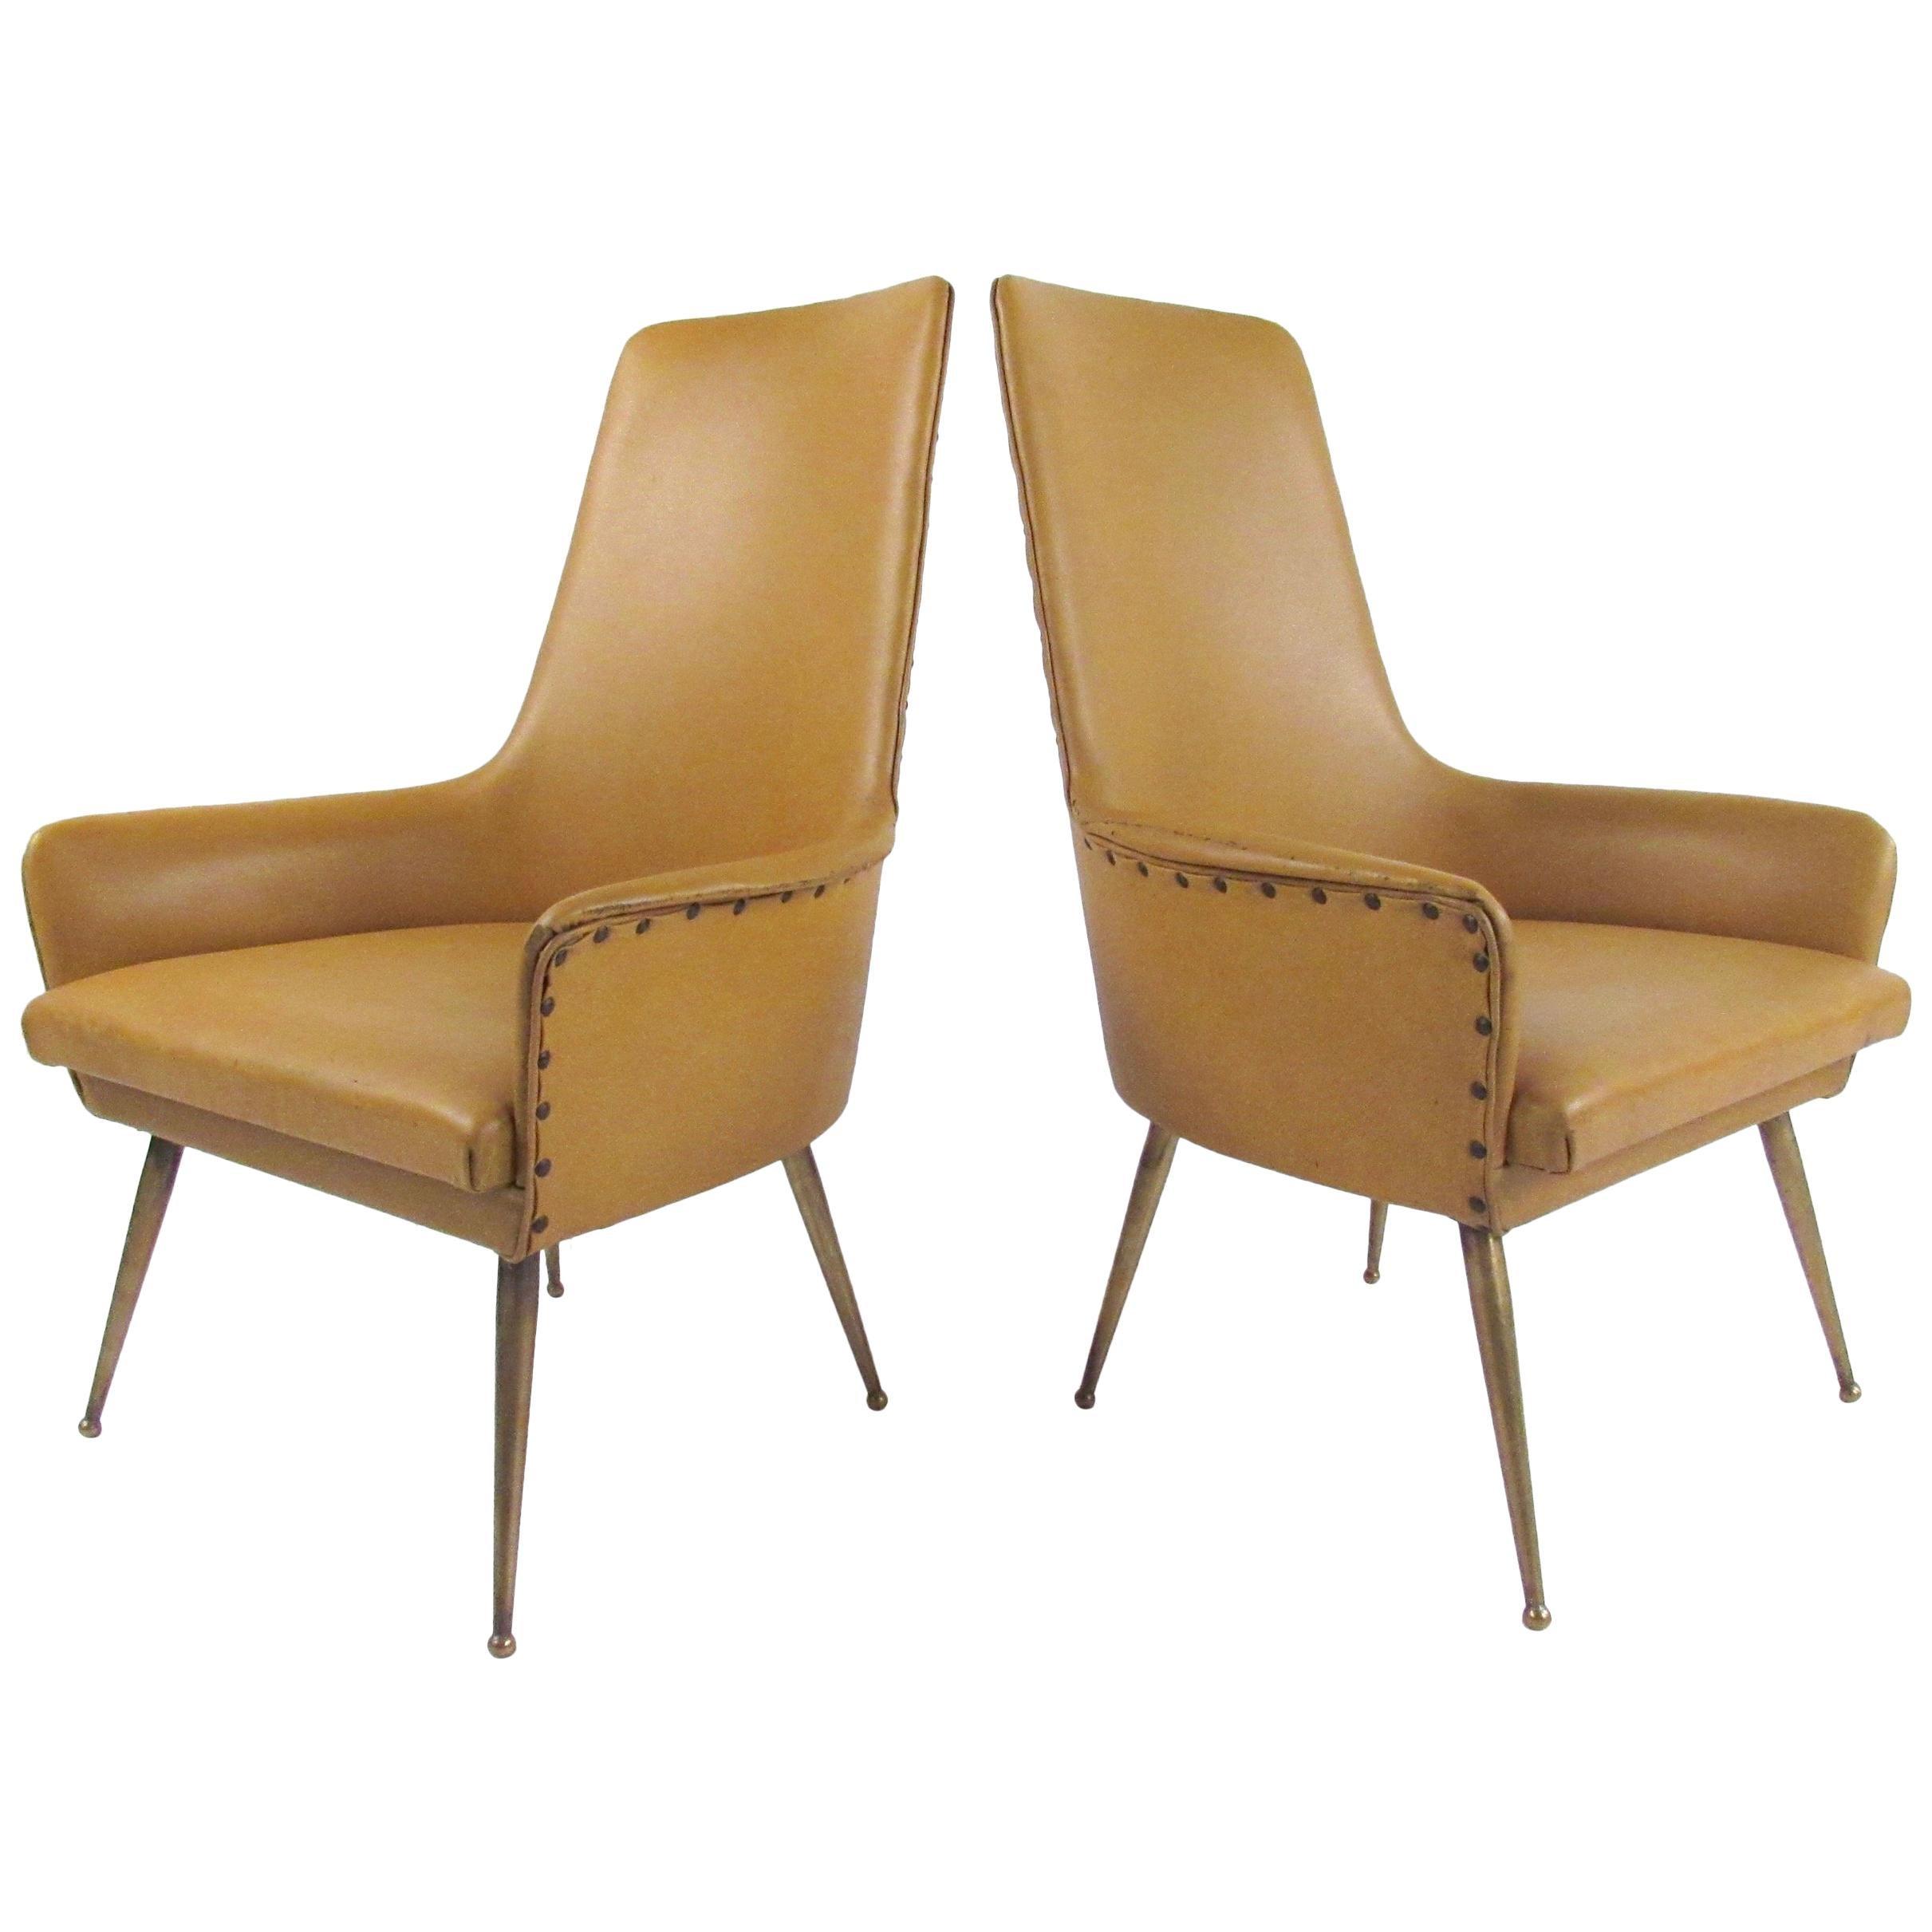 Pair of Italian Modern Side Chairs, circa 1950s